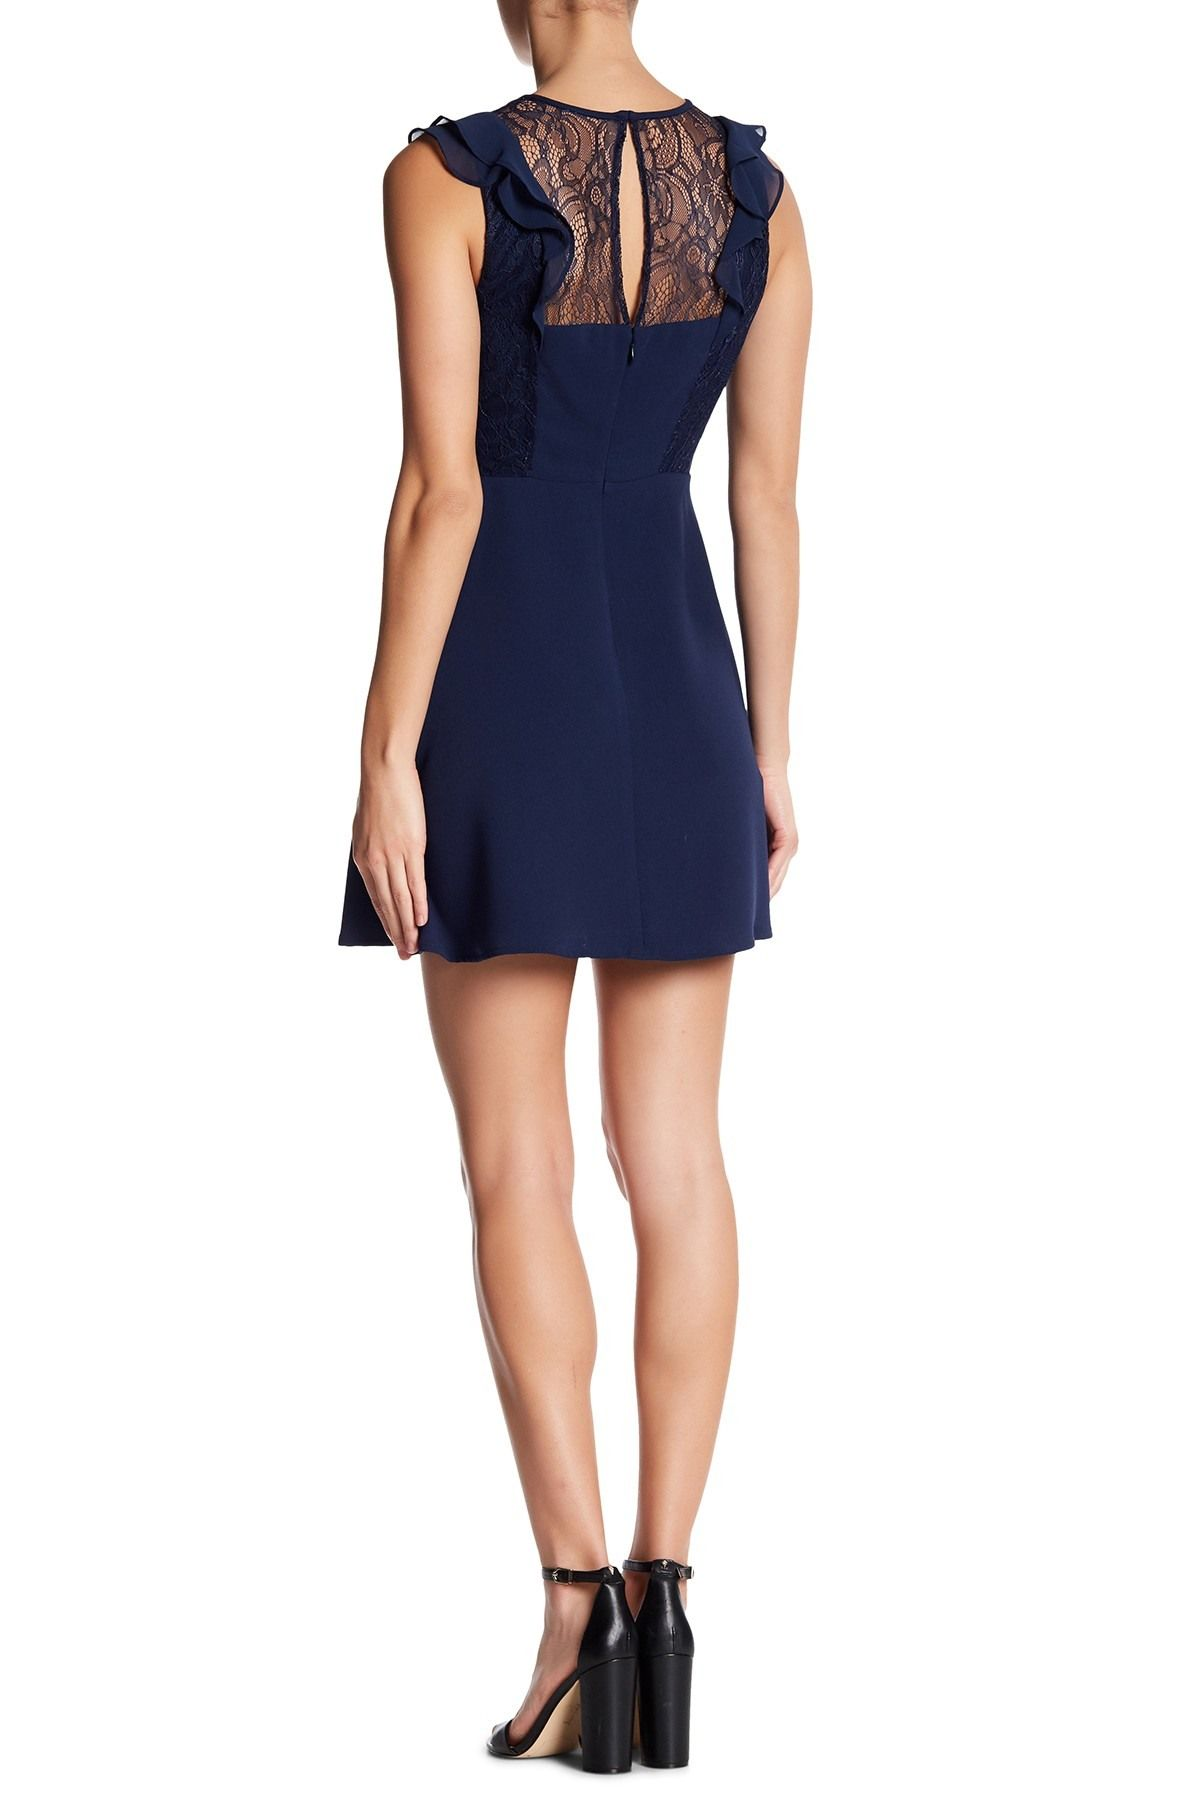 Ruffle lace sleeveless dress ruffles nordstrom and shopping